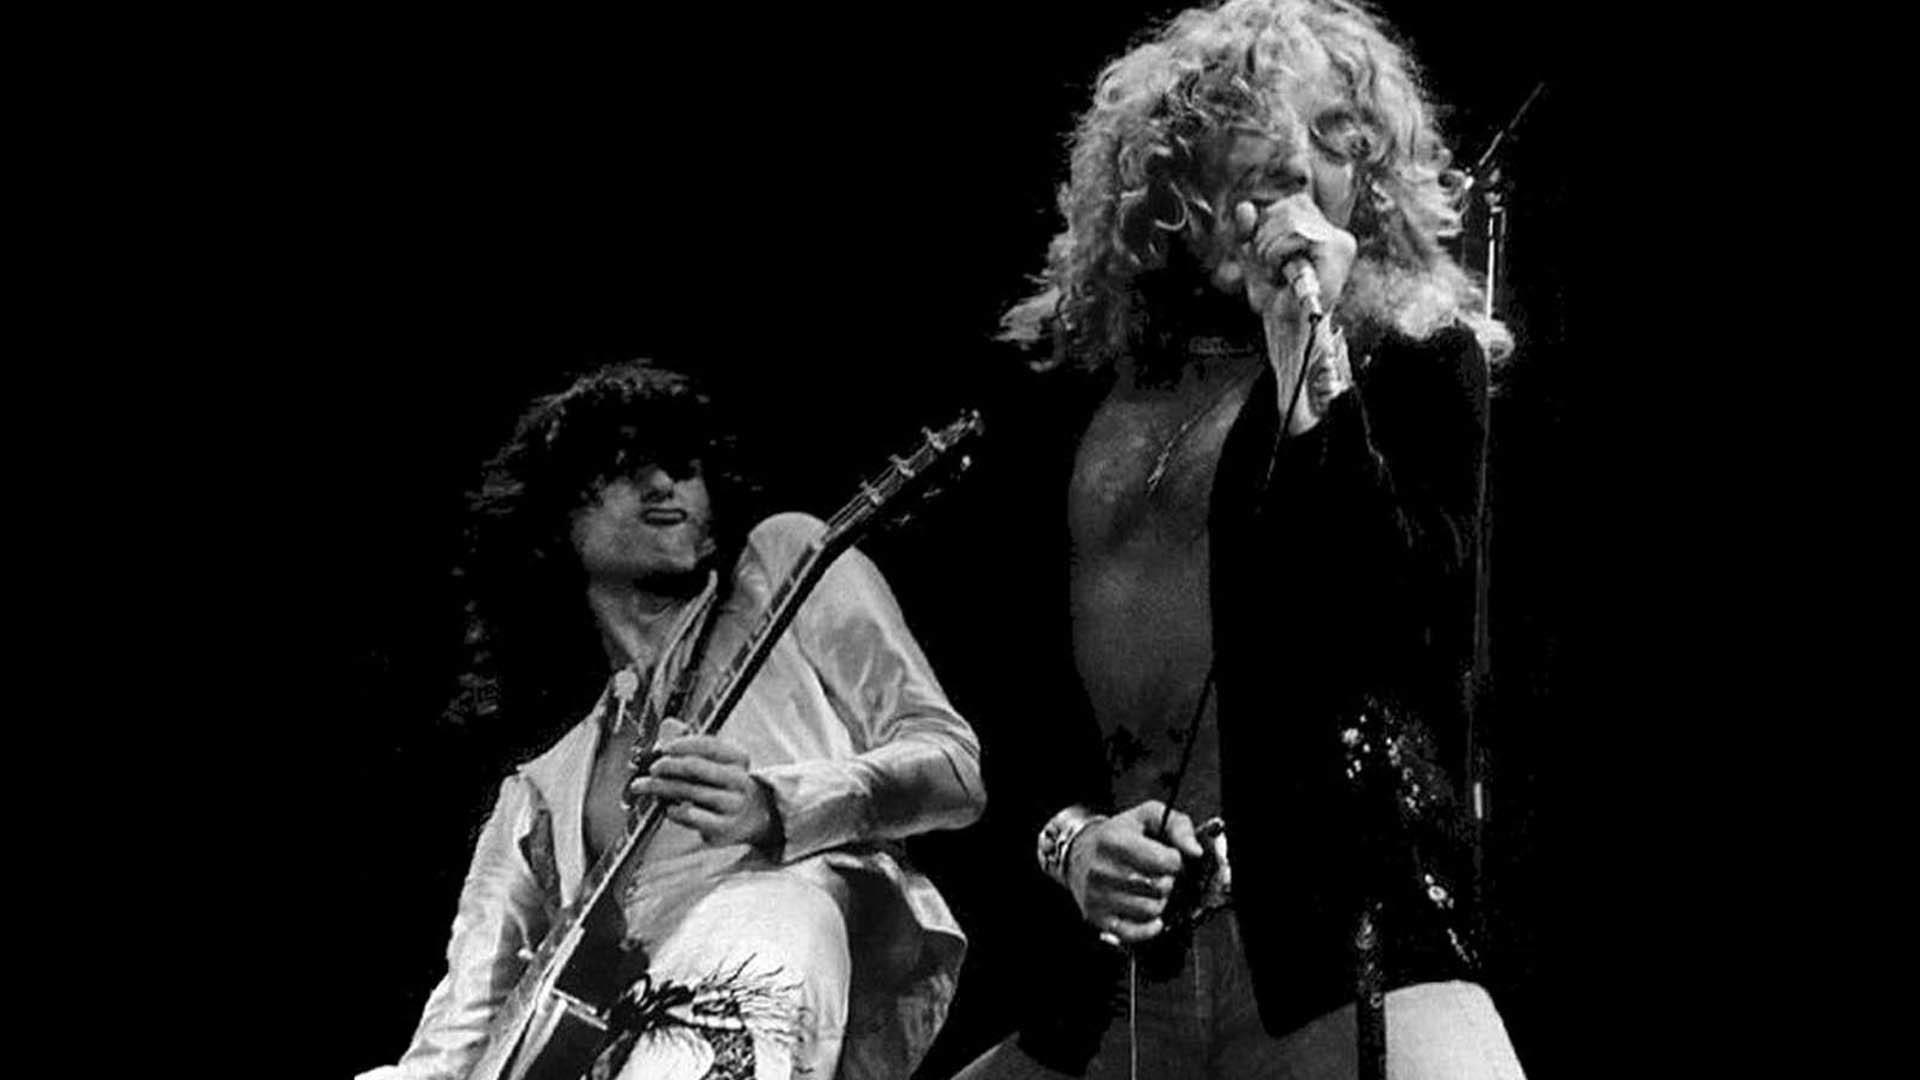 Led Zeppelin Wallpaper 72 Immagini